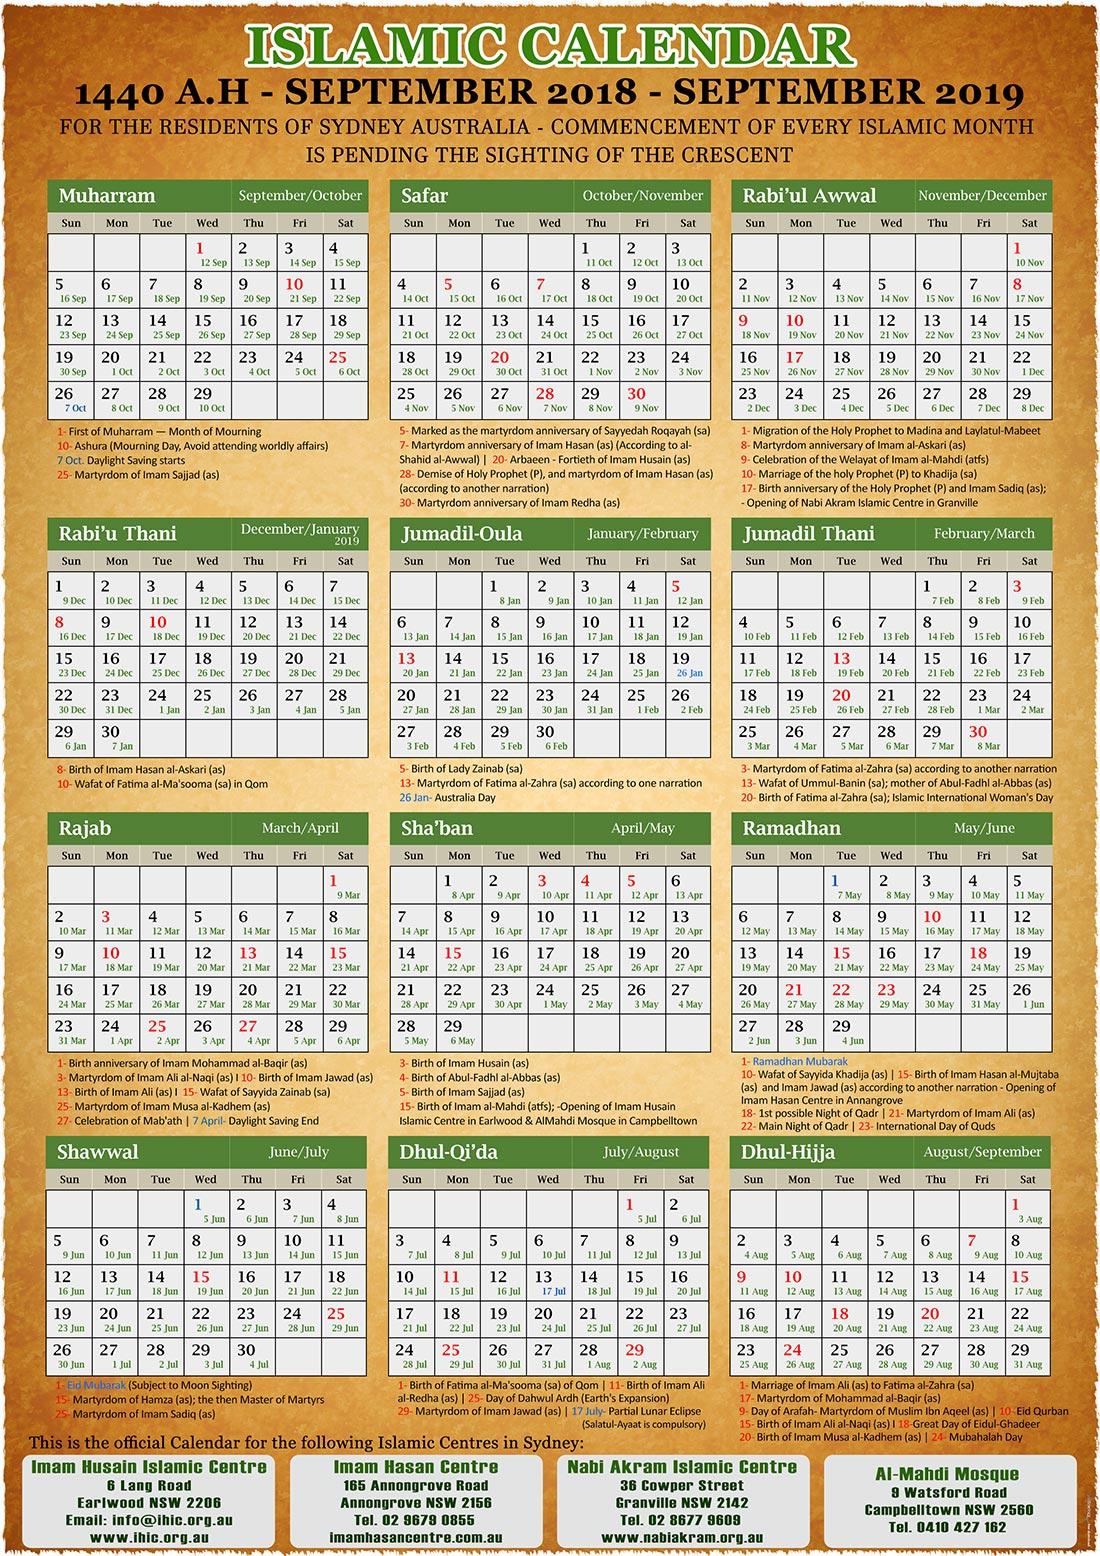 annual islamic calendar 1440 ah 2019